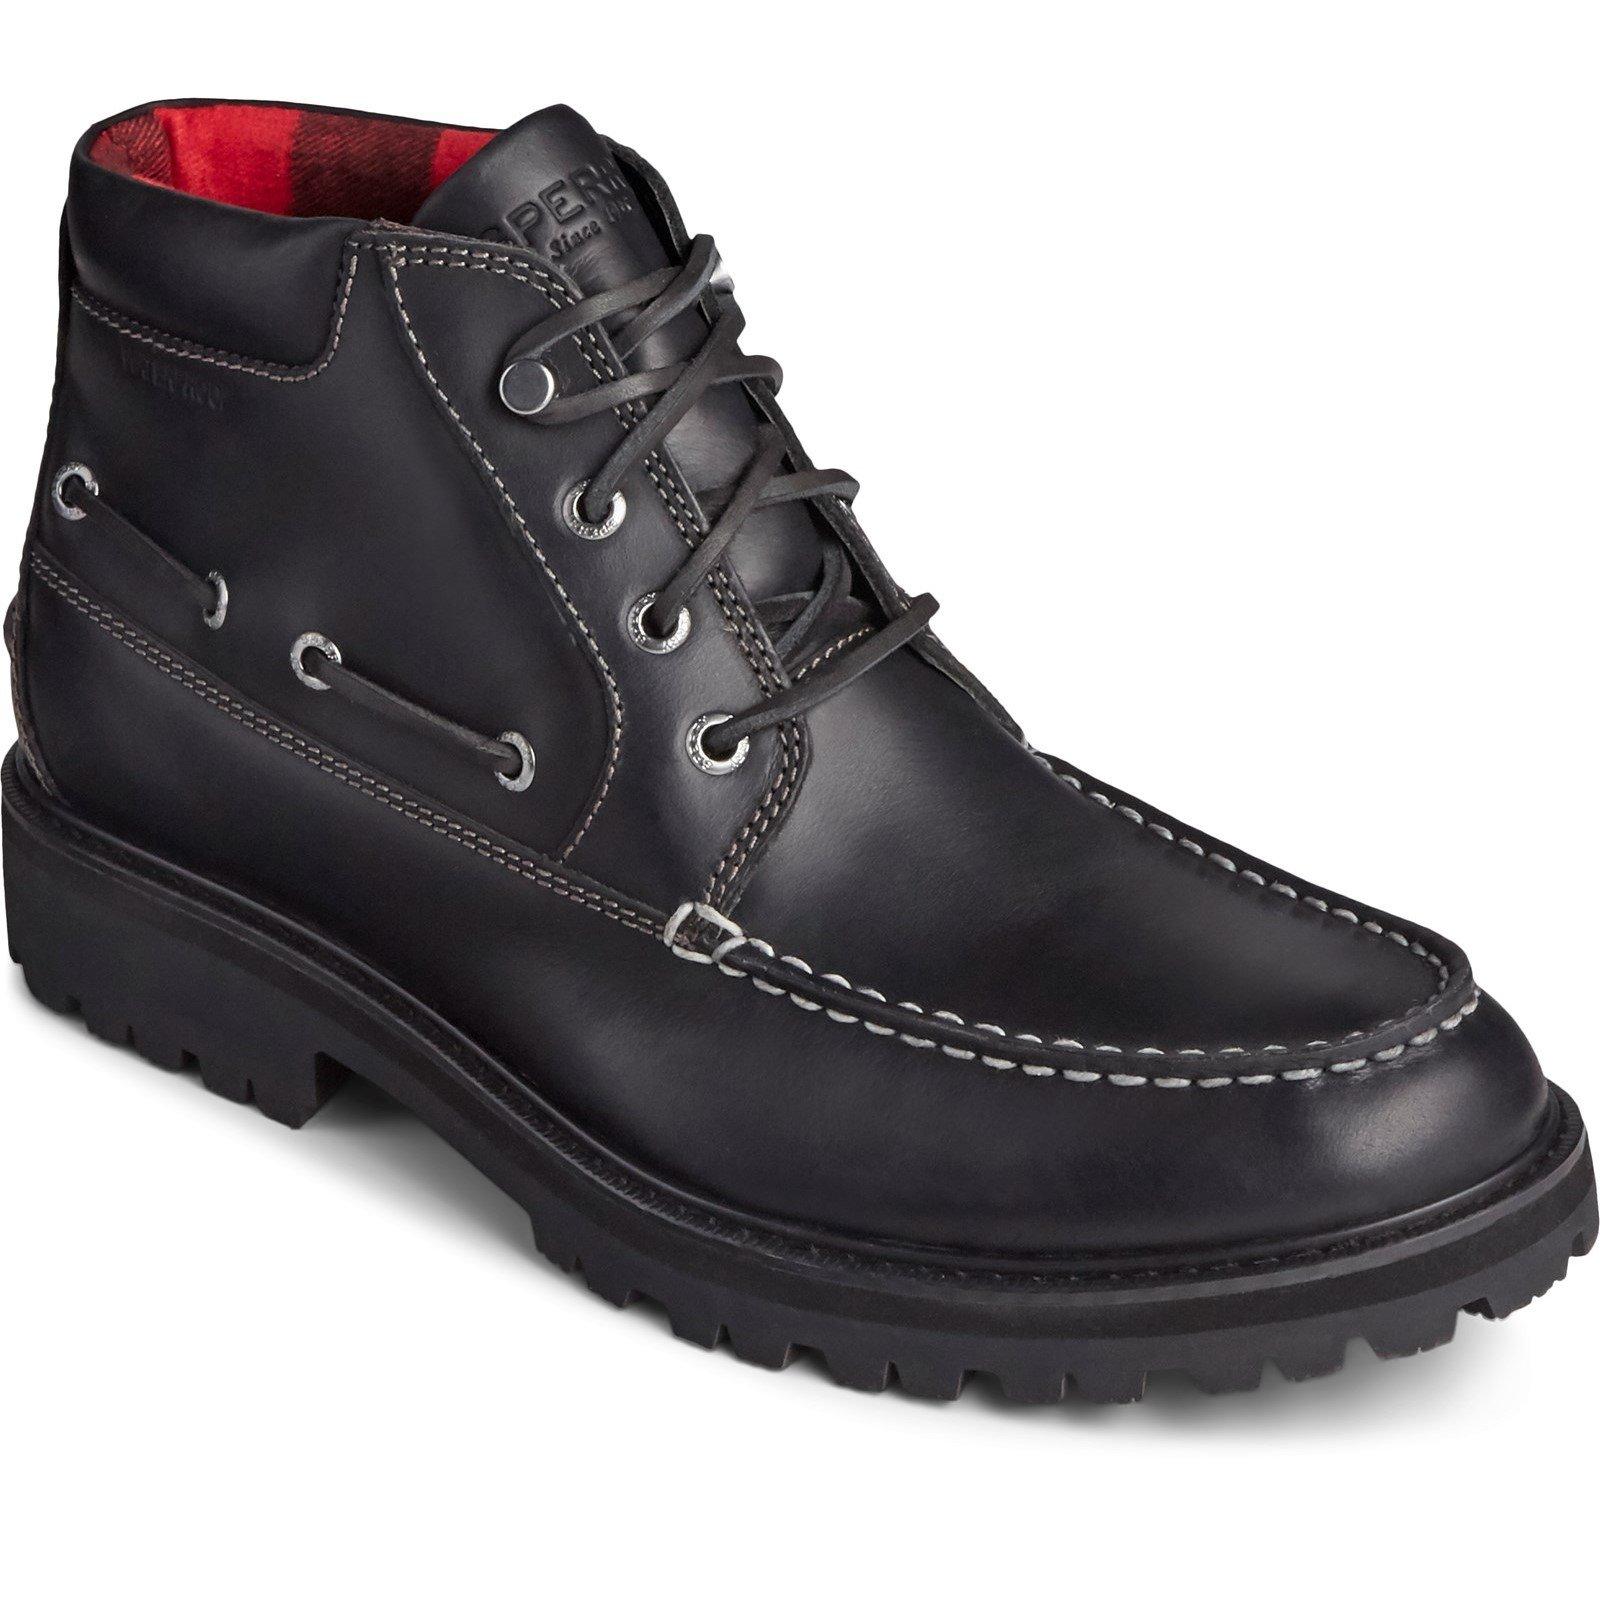 Sperry Men's Authentic Original Lug Chukka Boot Various Colours 32068 - Black 10